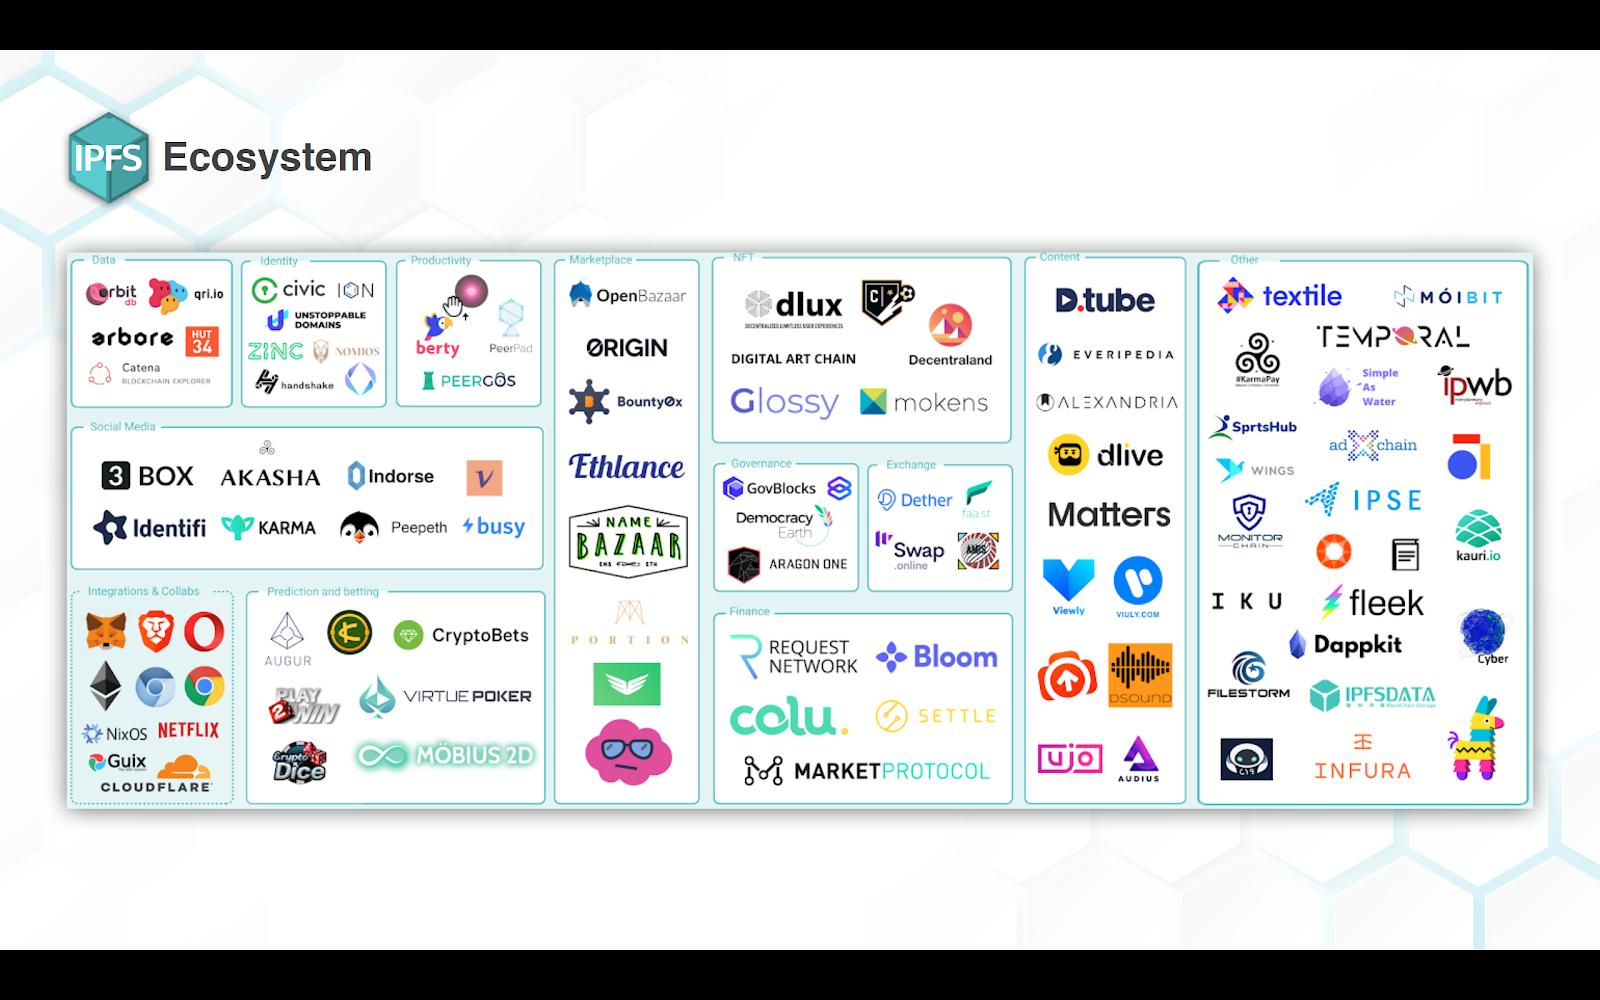 IPFS ecosystem